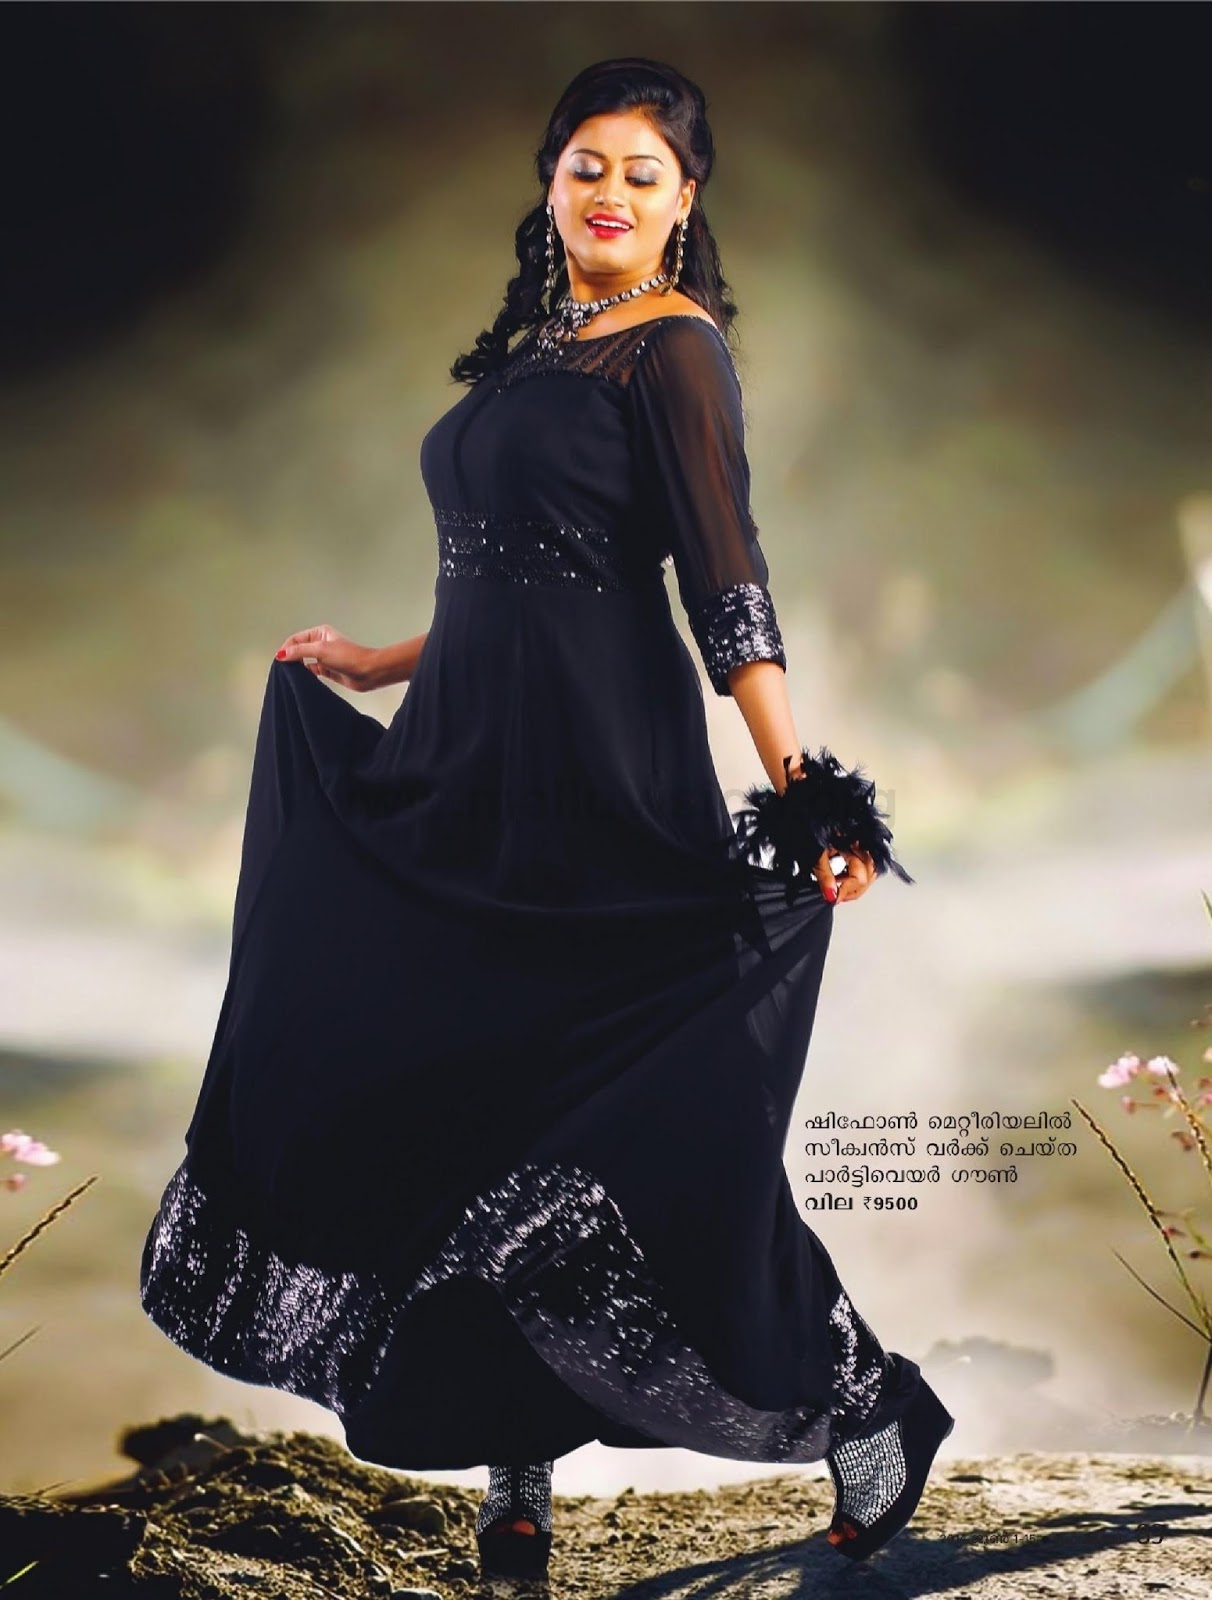 Bollywood sex hot photoshoot Shruti Hassan - YouTube